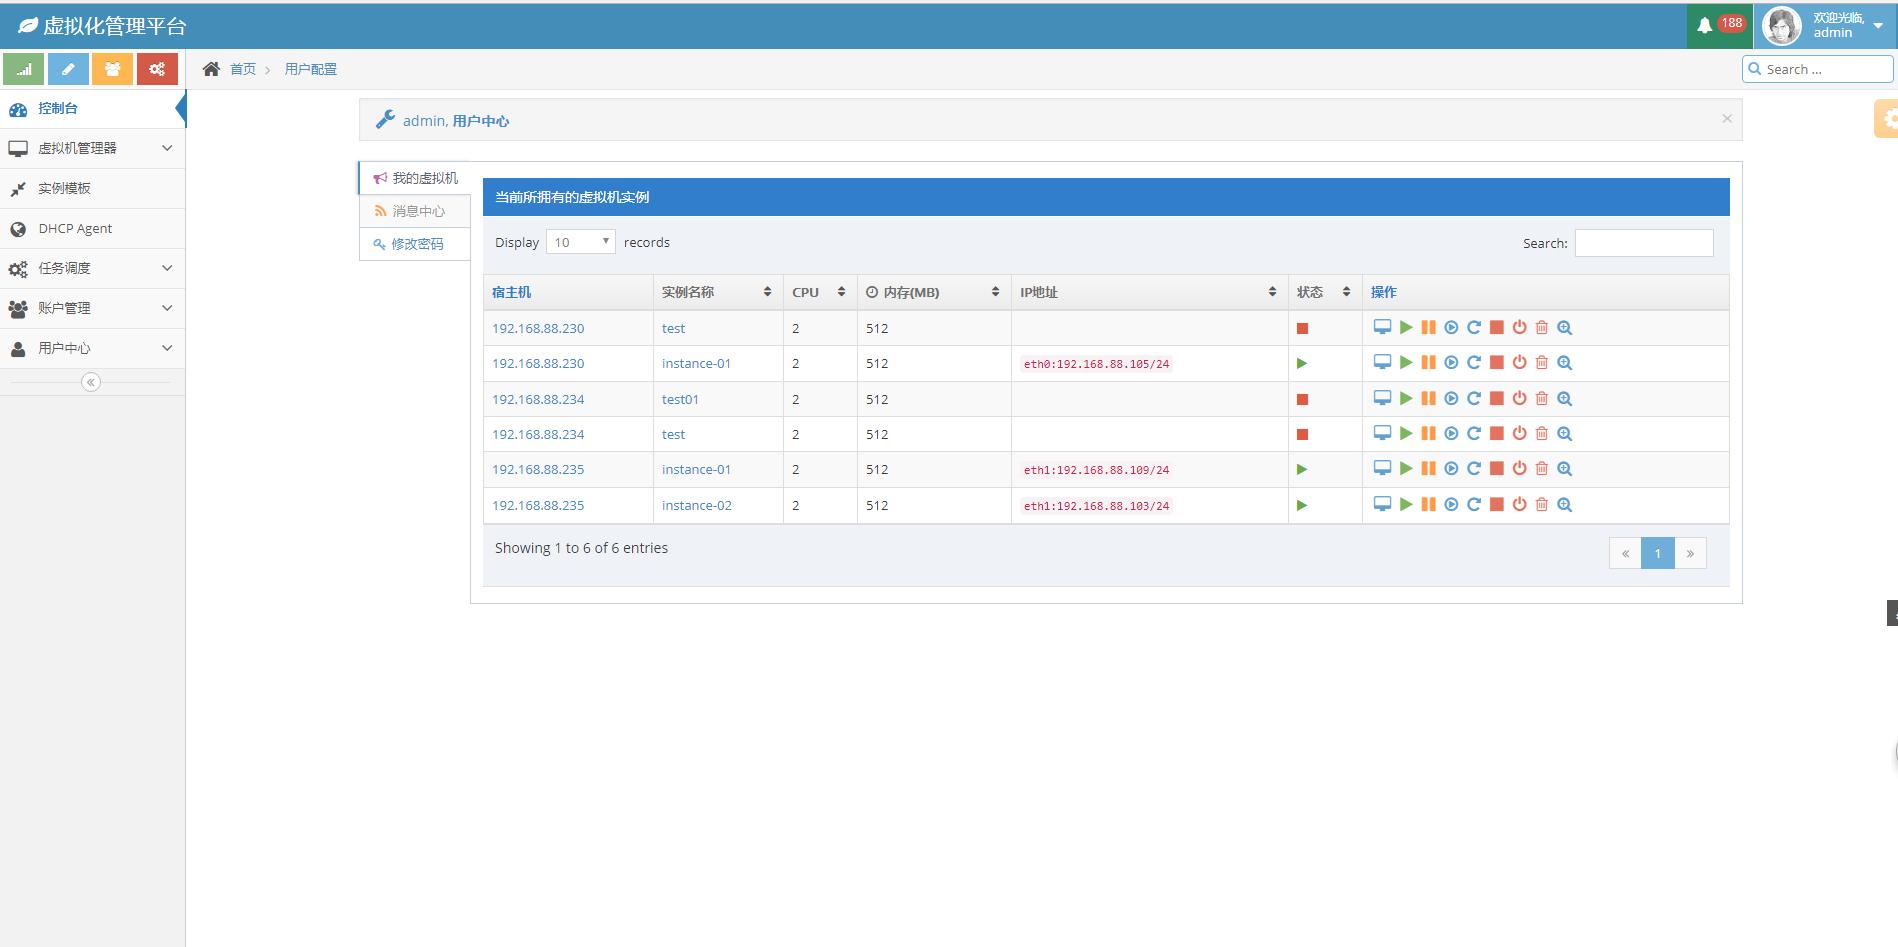 VManagePlatform 国人开发的 KVM VPS 管理平台面板